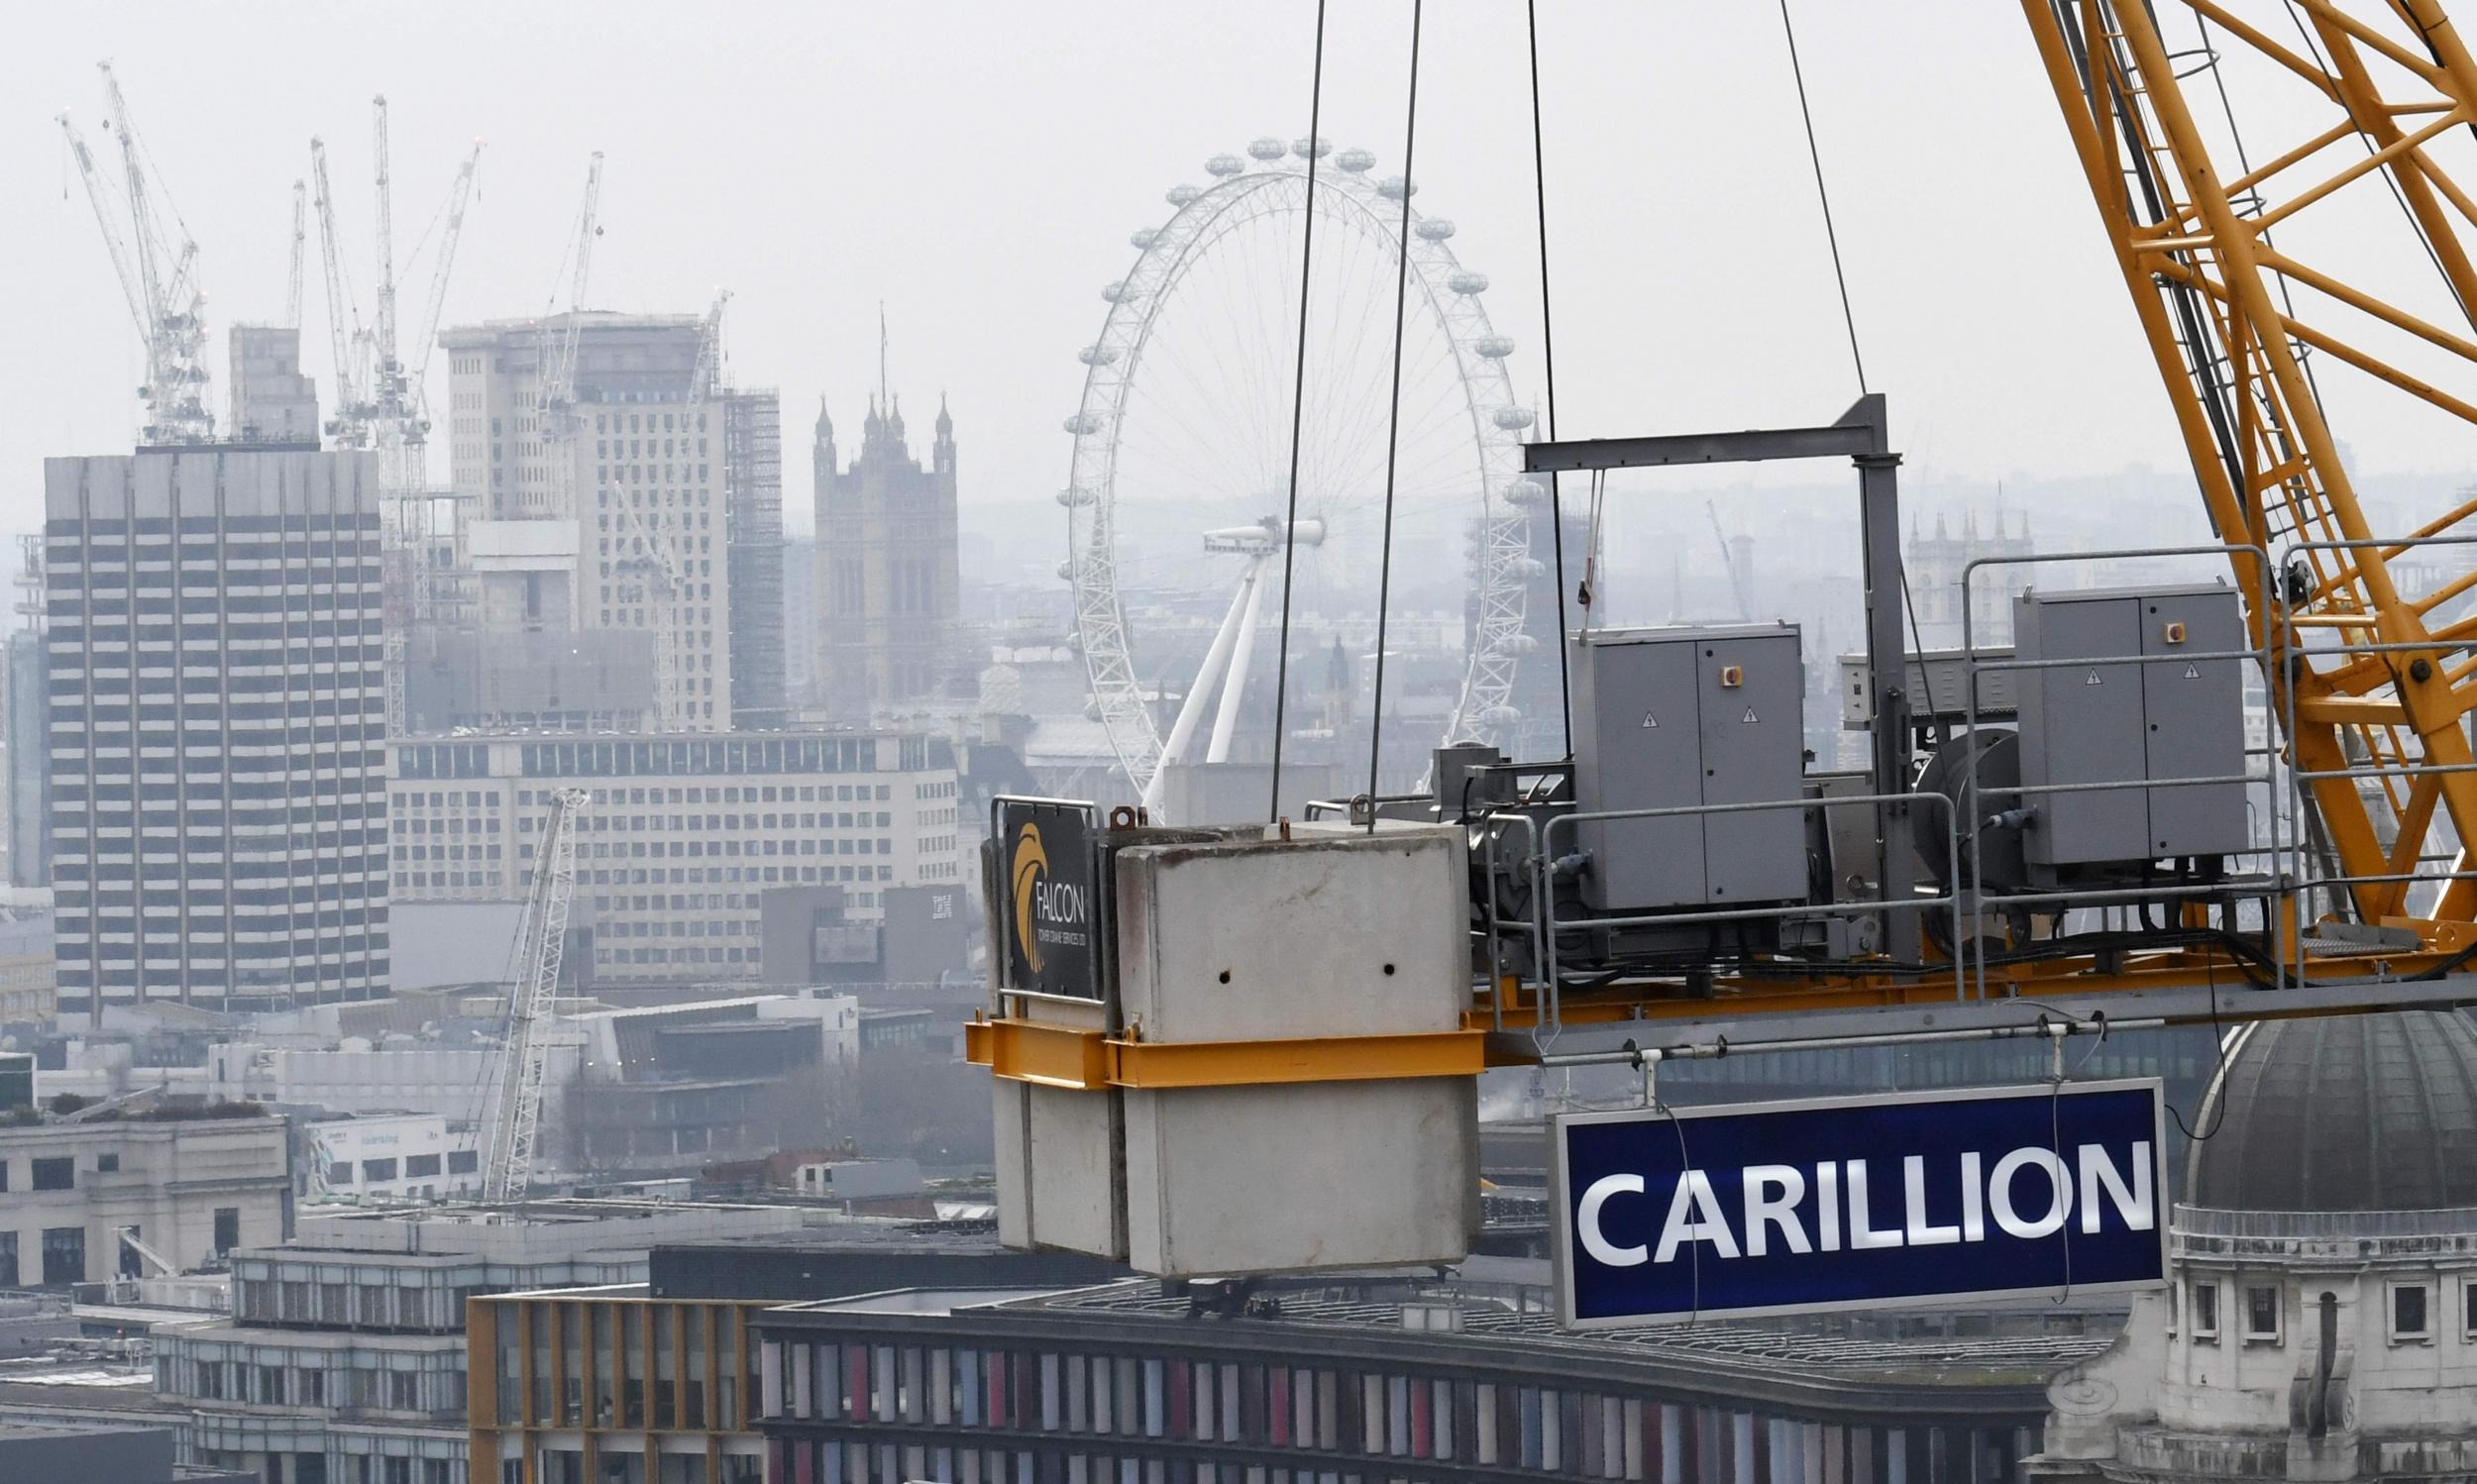 Carillion collapse: Government contractor enters compulsory